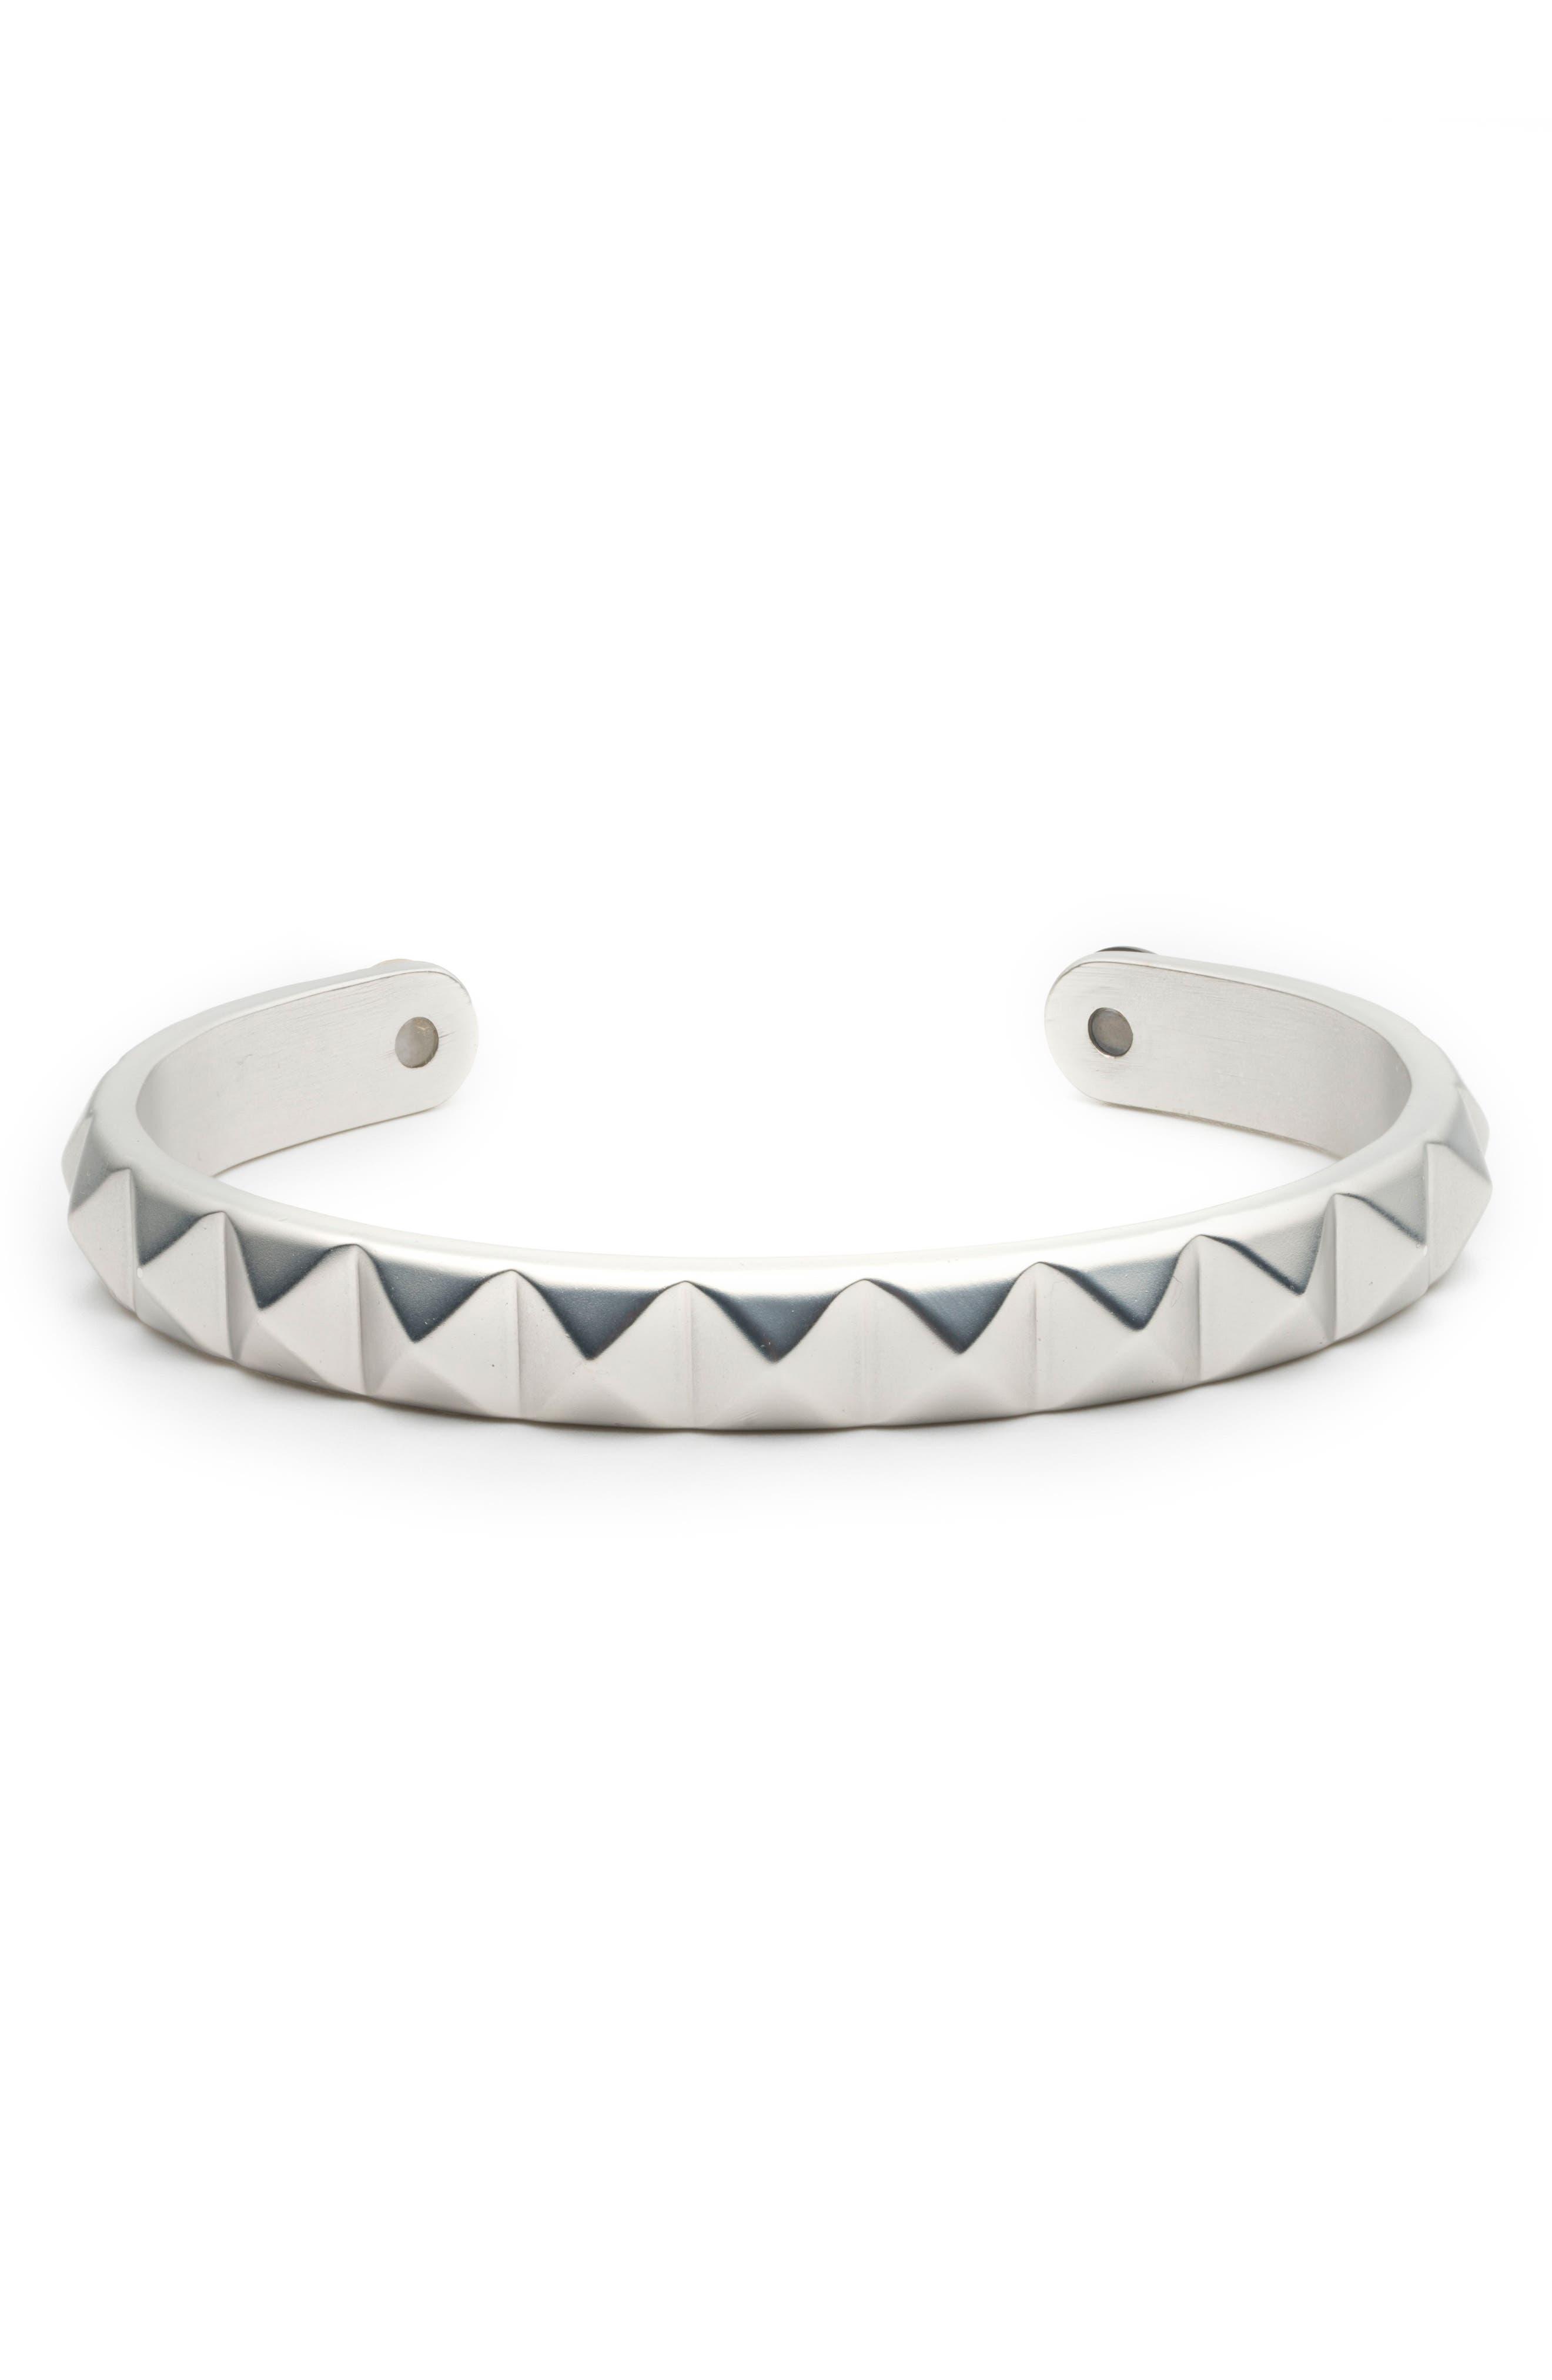 Cuff Bracelet,                         Main,                         color, Silver